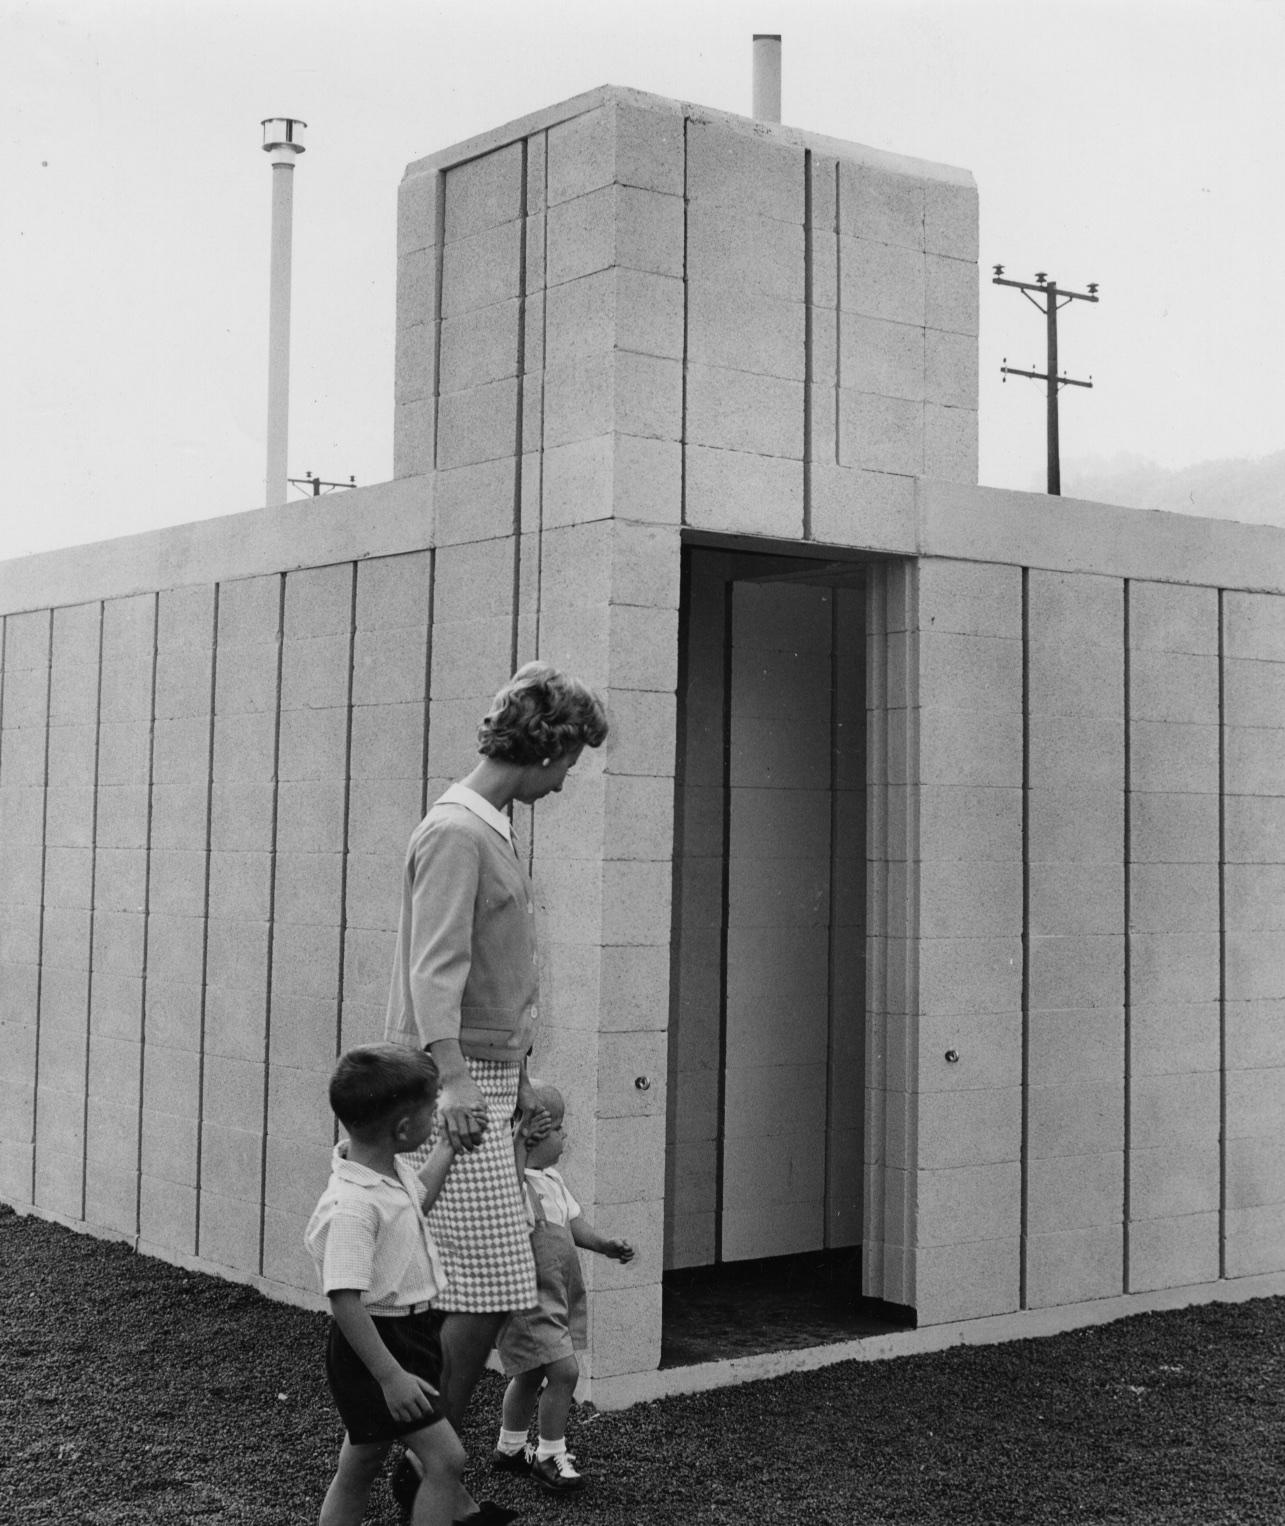 Sept. 27, 1961: A fallout shelter on Neville Island. (Post-Gazette)